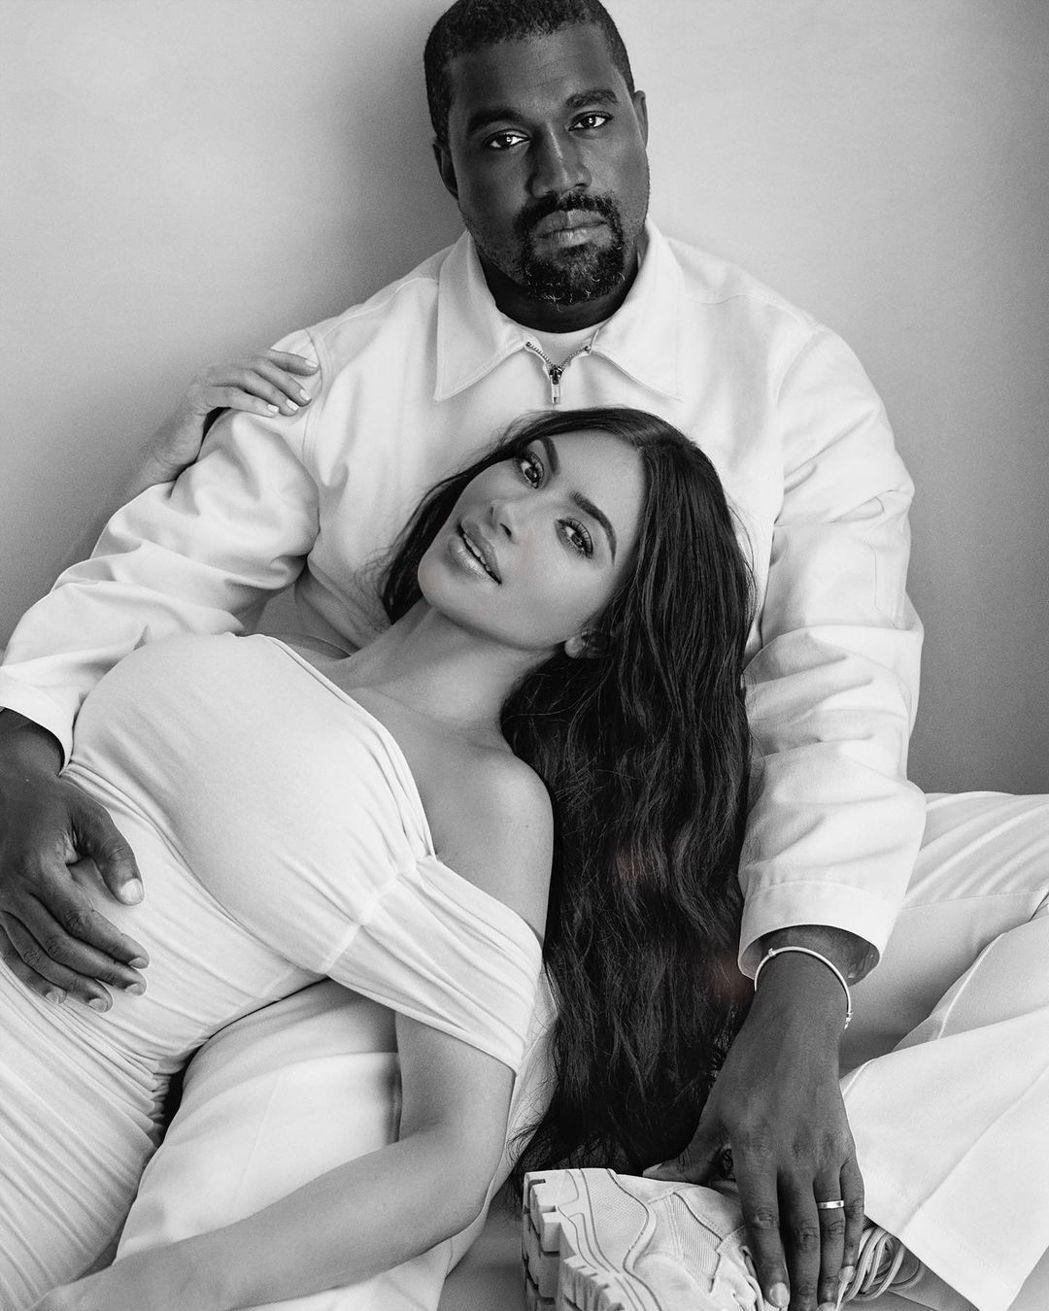 金卡戴珊(Kim Kardashian)與肯伊威斯特(Kanye West)被爆